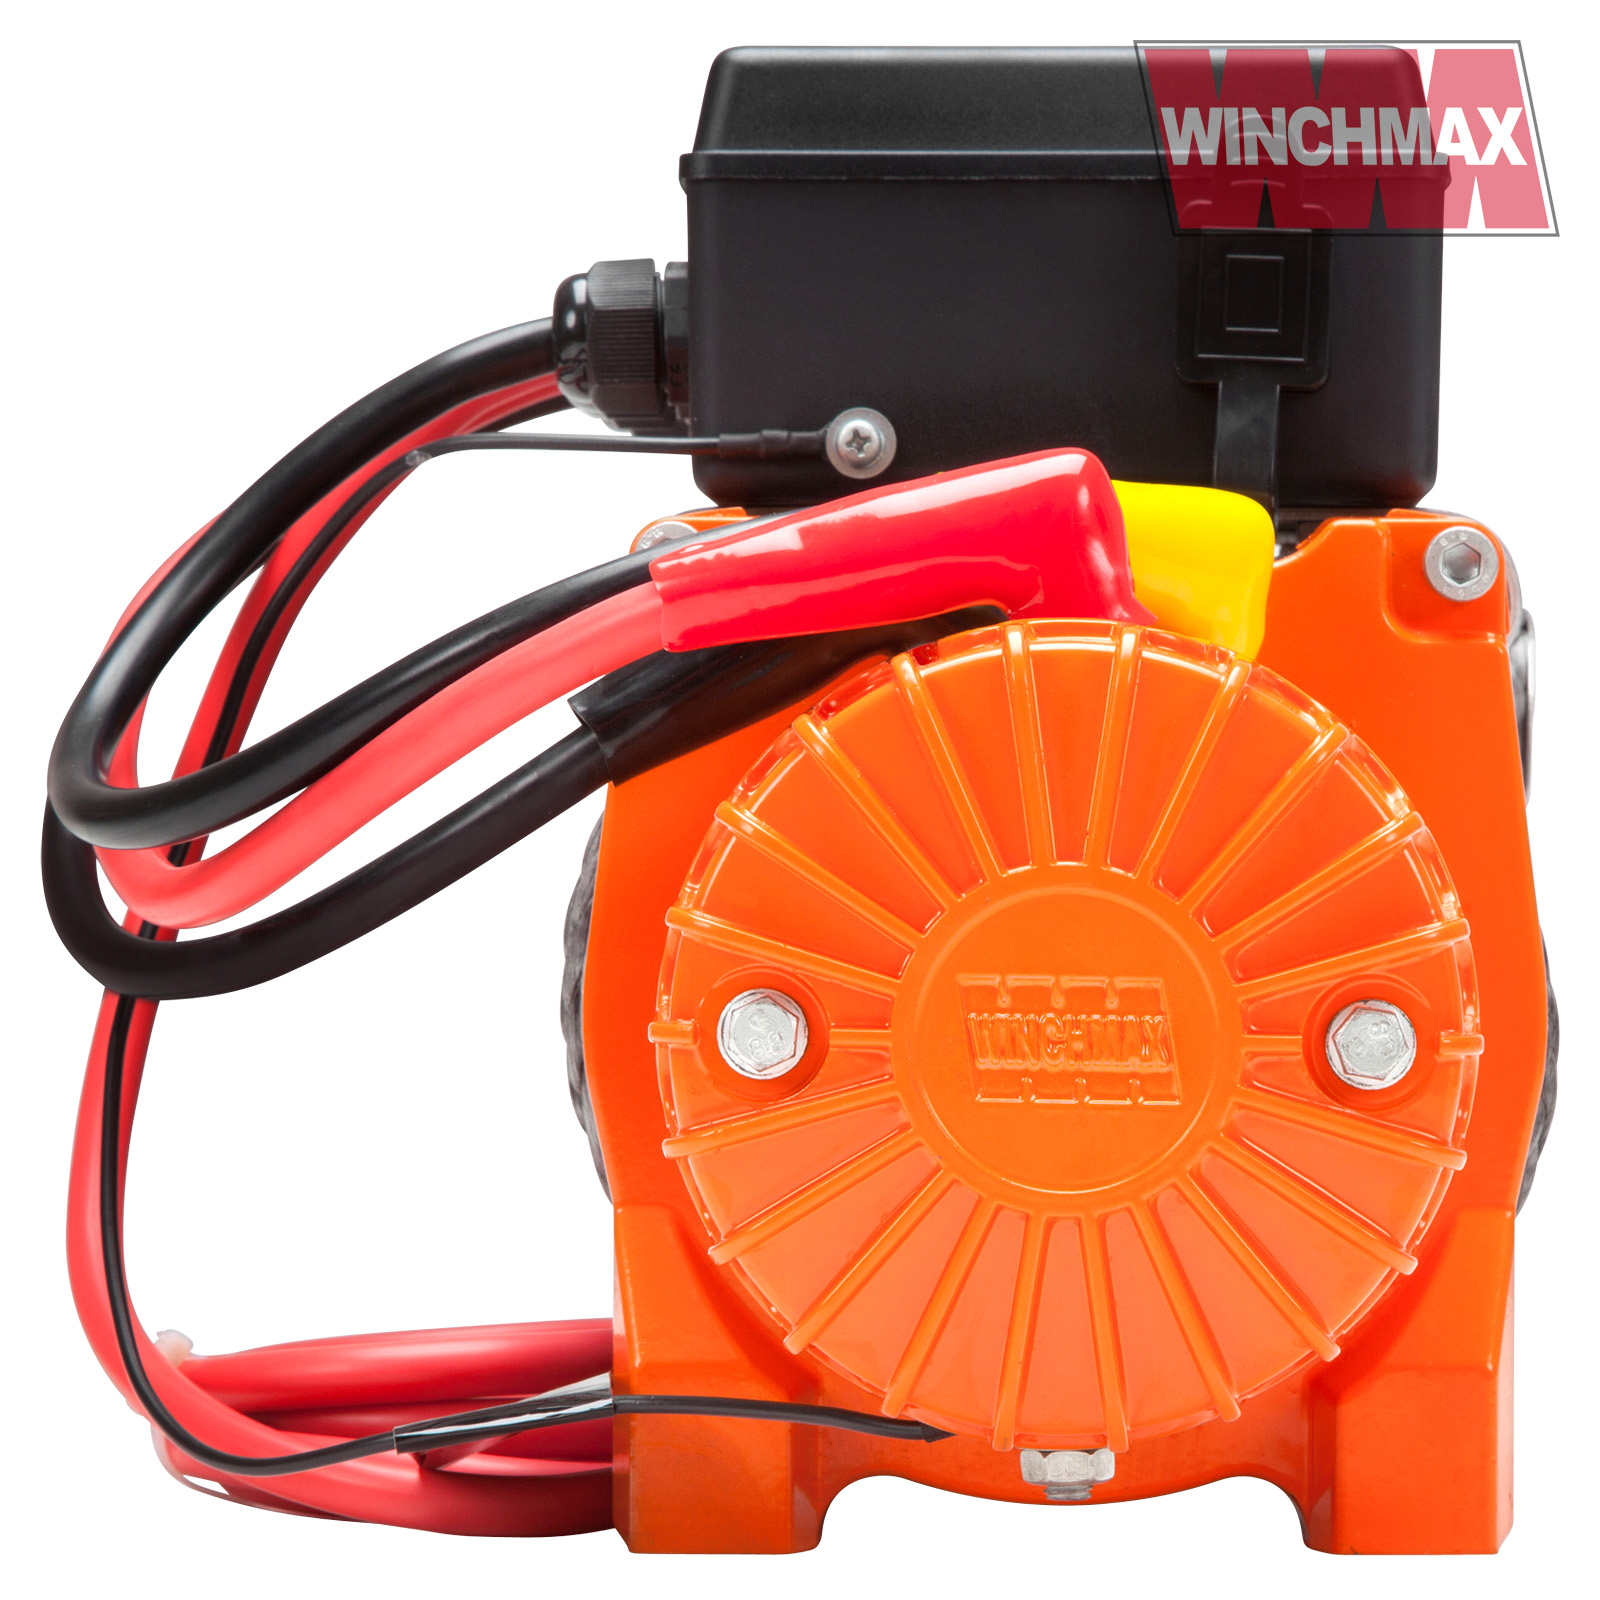 Wm1350012vsyn winchmax 510